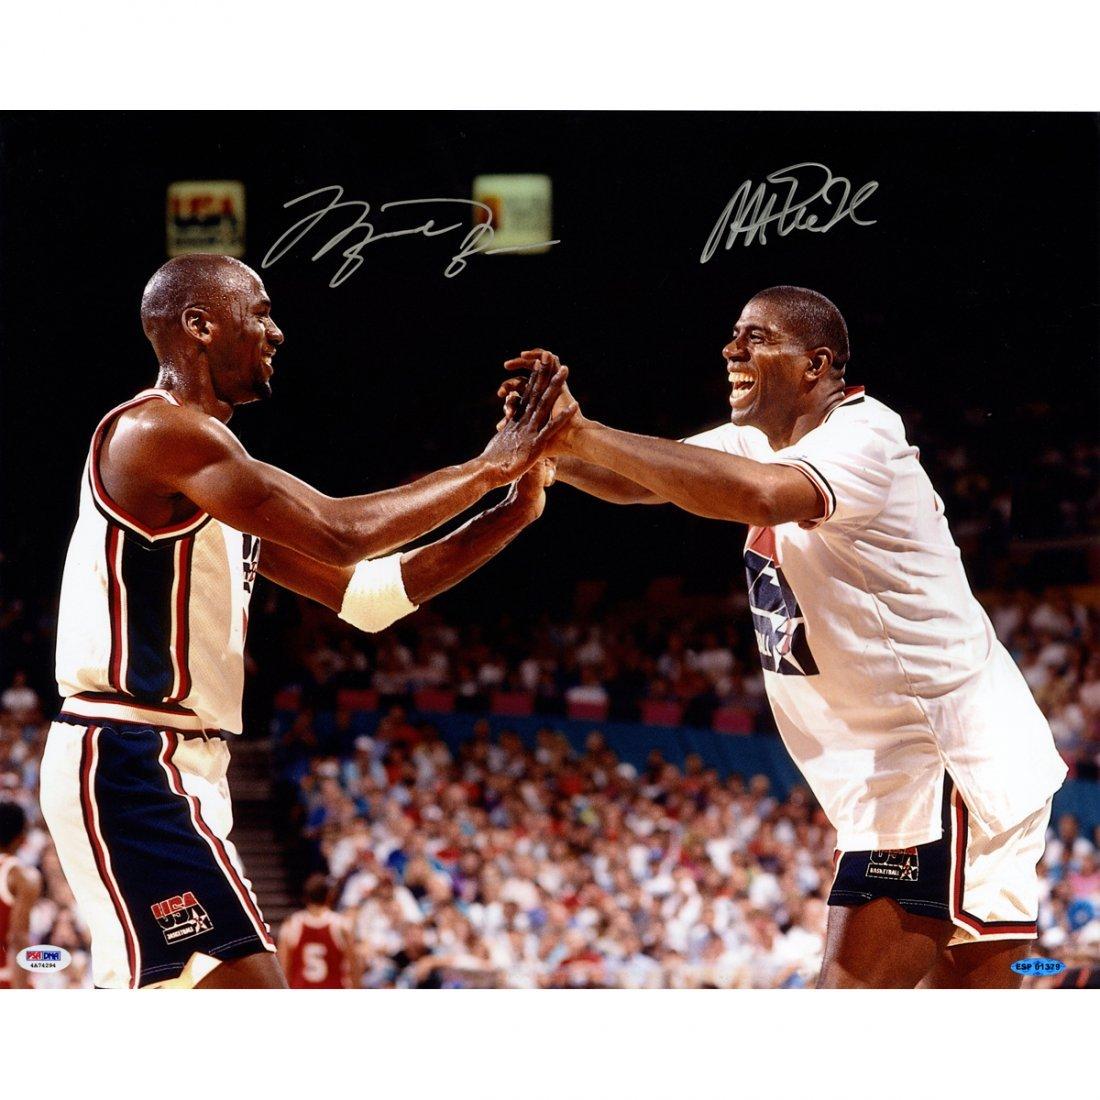 Michael Jordan / Magic Johnson Dual Signed Celebartion